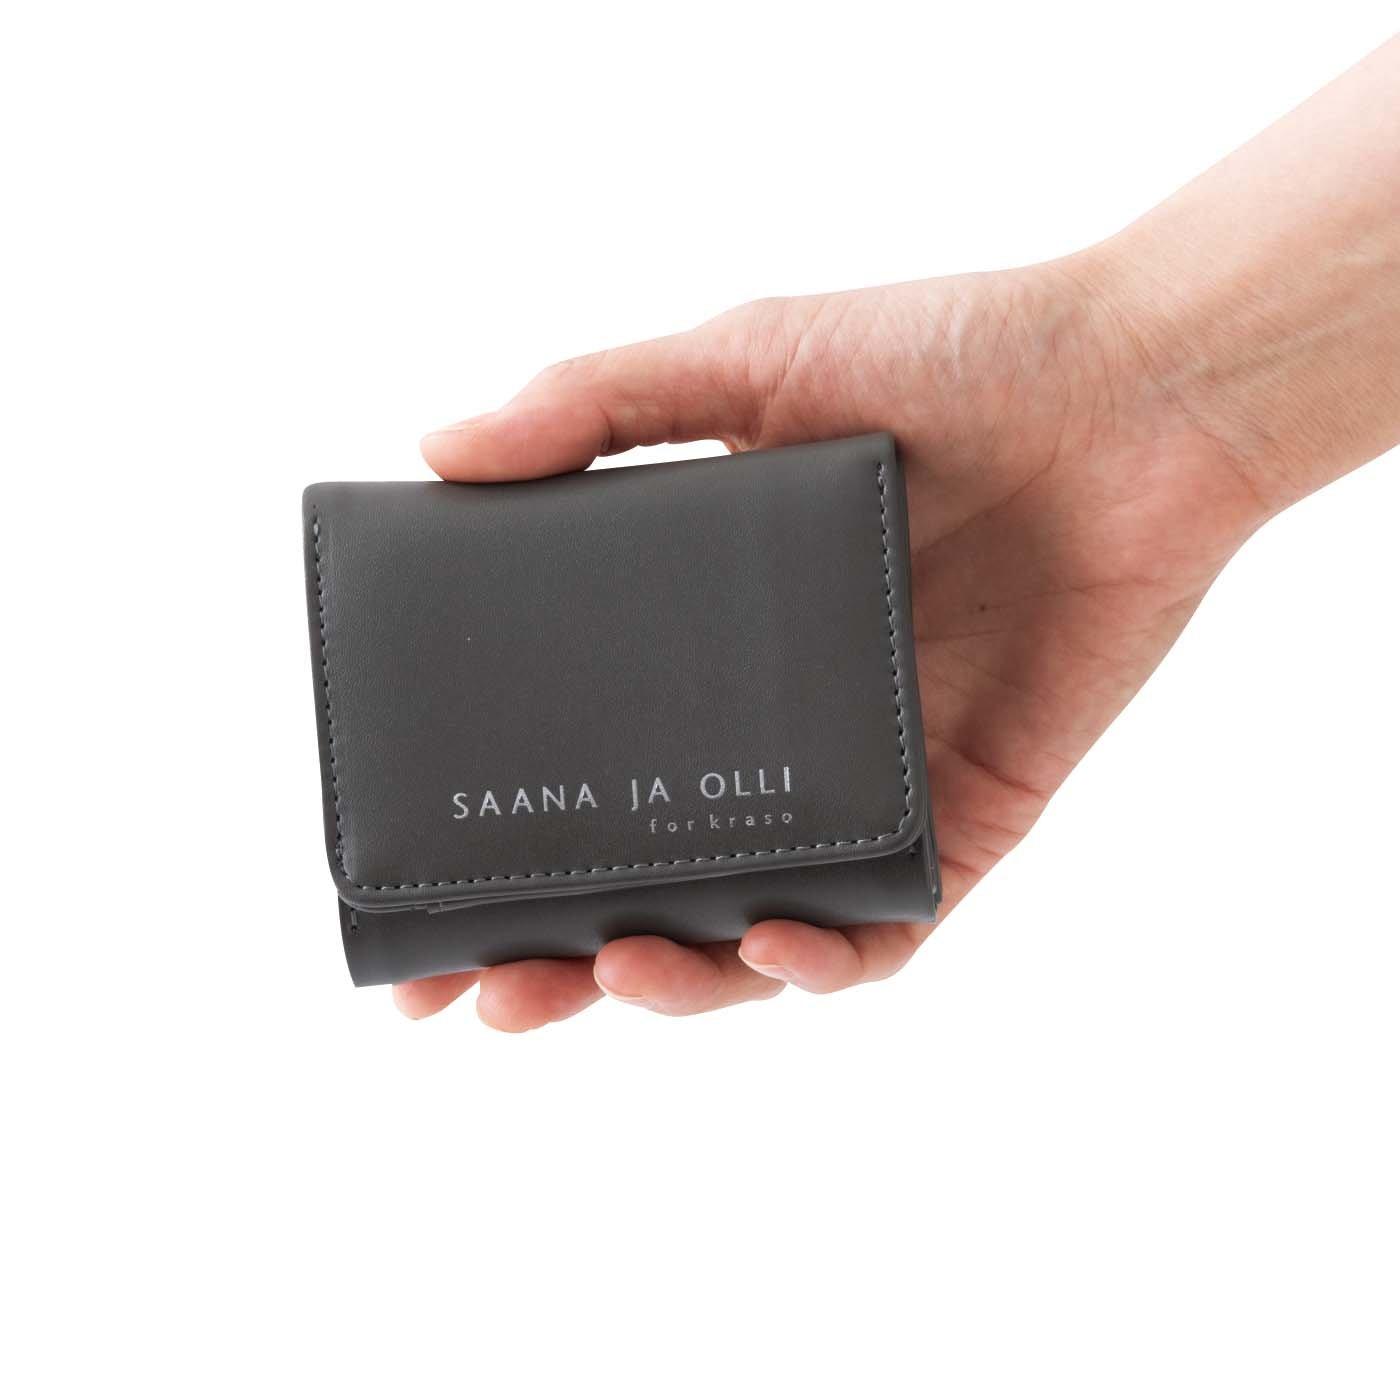 SAANA JA OLLI サーナ ヤ オッリ カードもお札もしっかり入るミニ財布の会